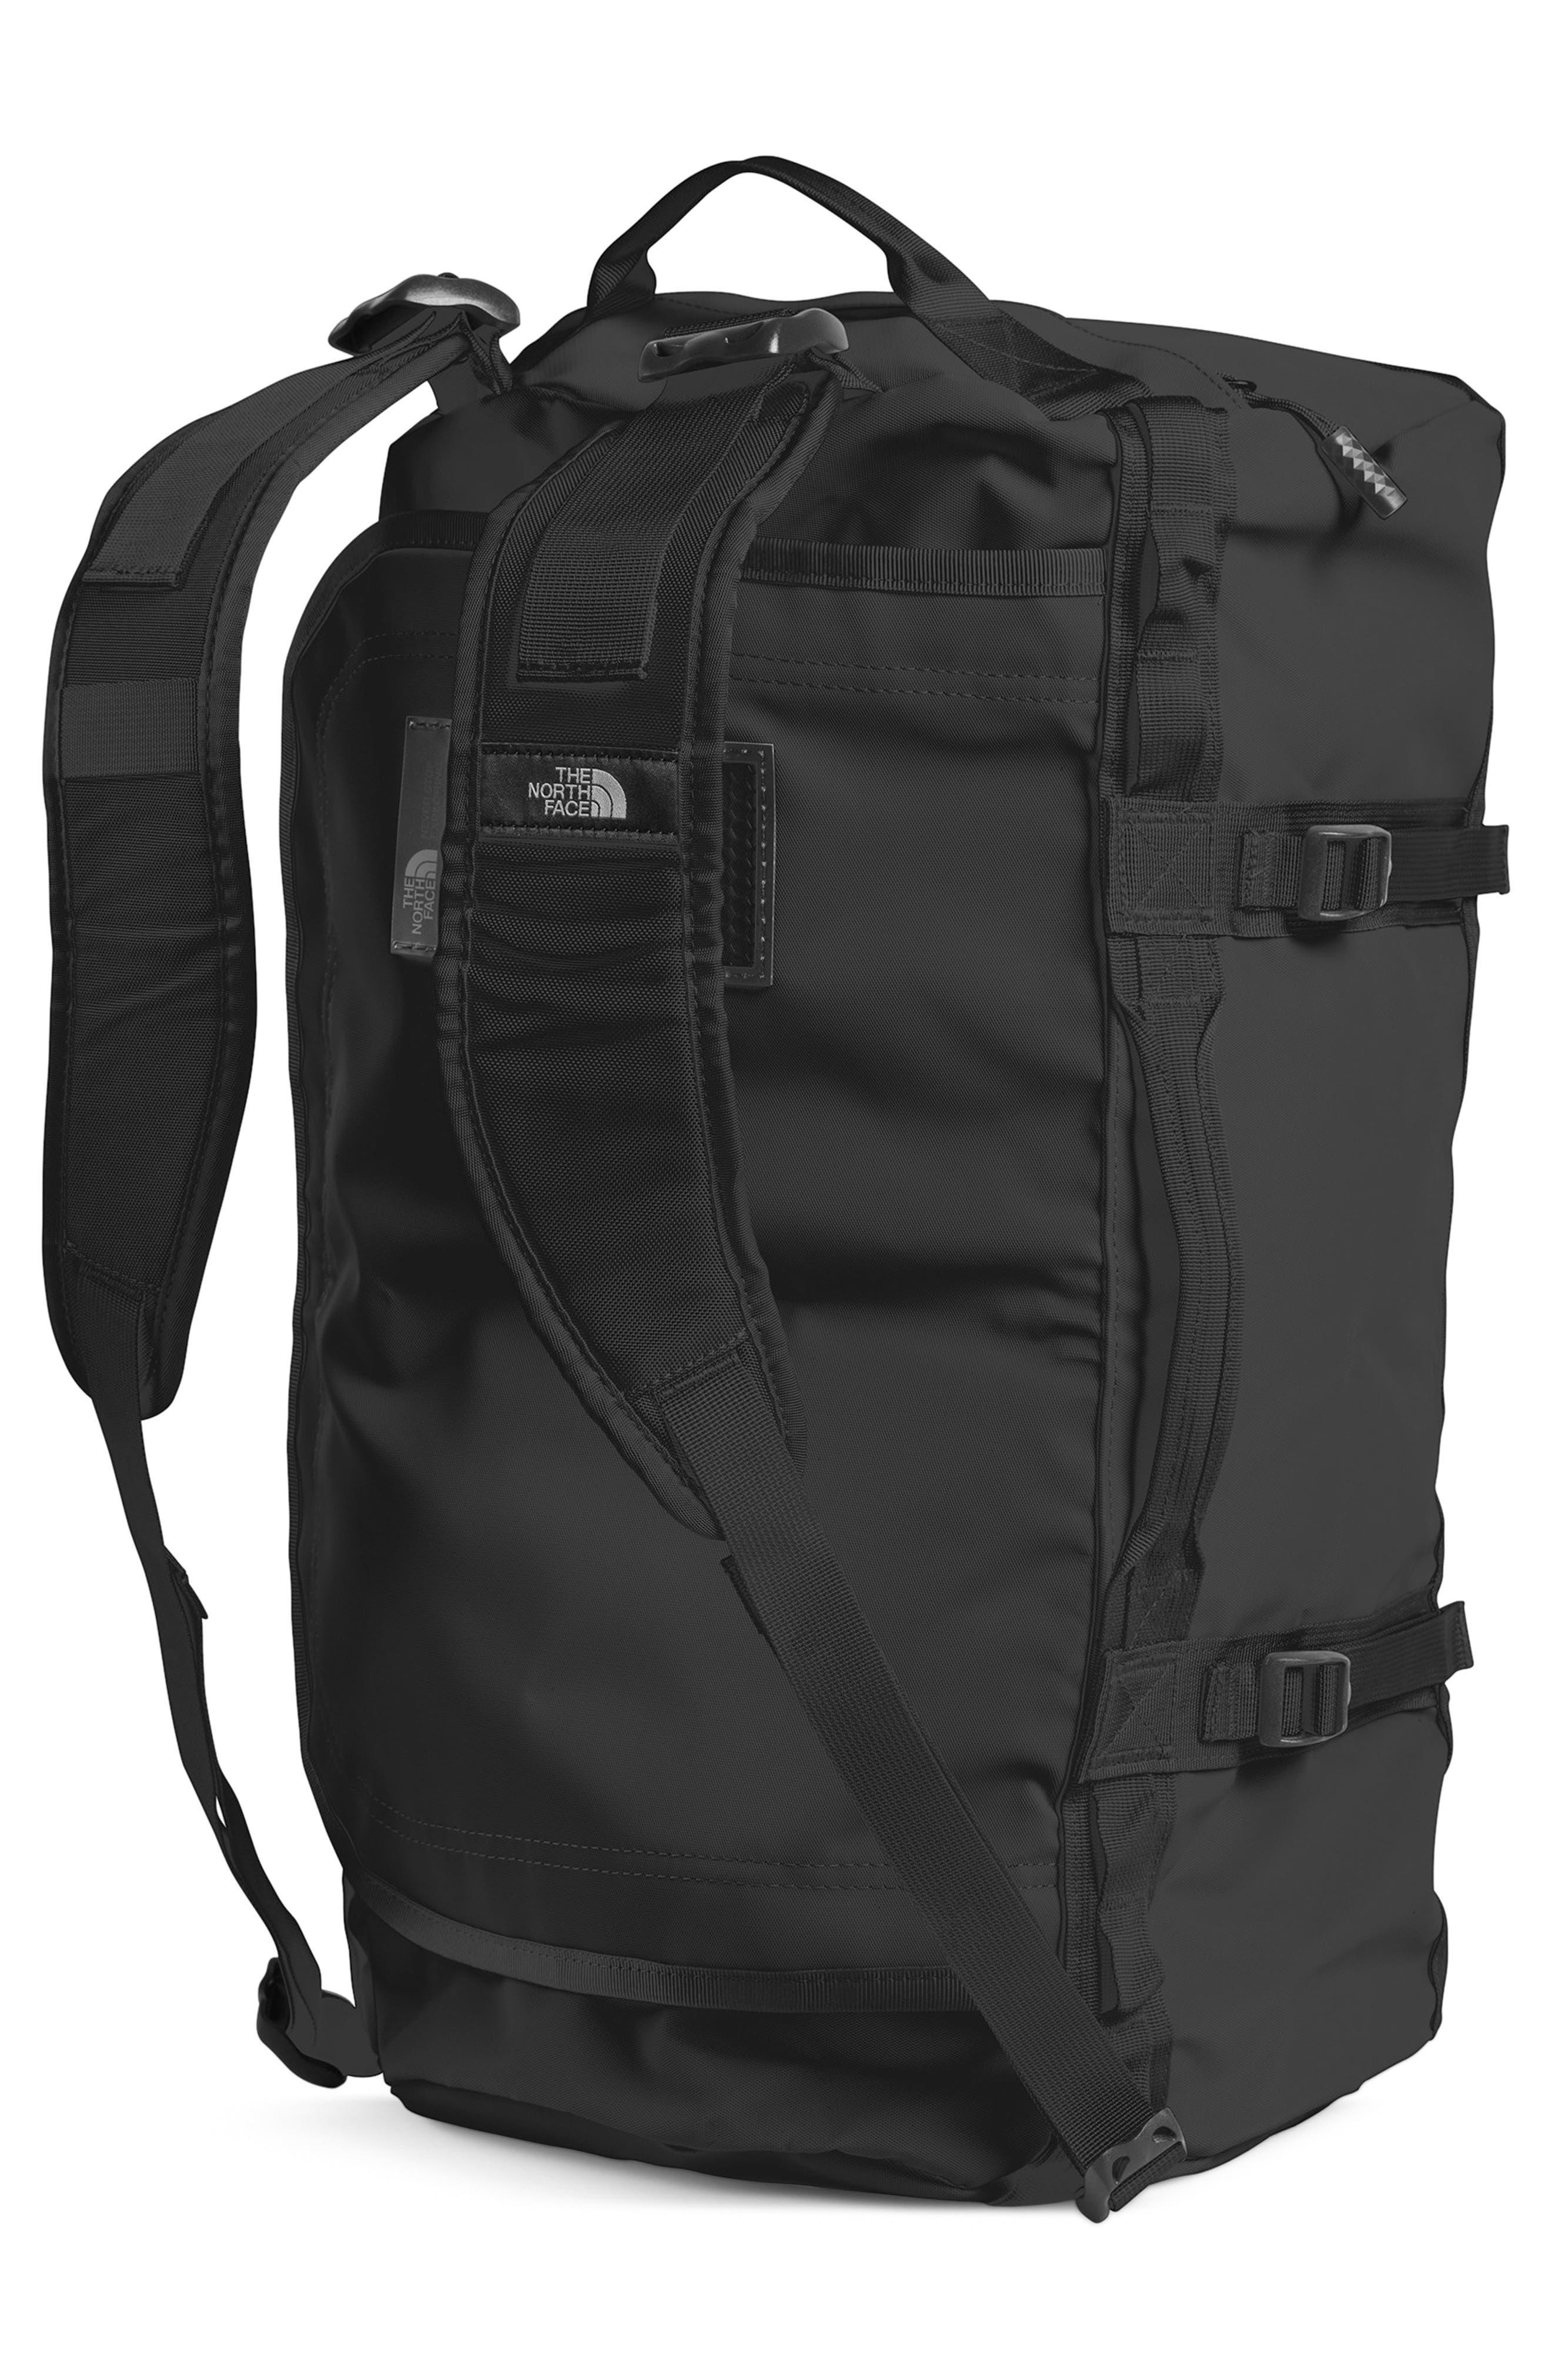 Base Camp Water Resistant Duffel Bag,                             Alternate thumbnail 2, color,                             TNF BLACK